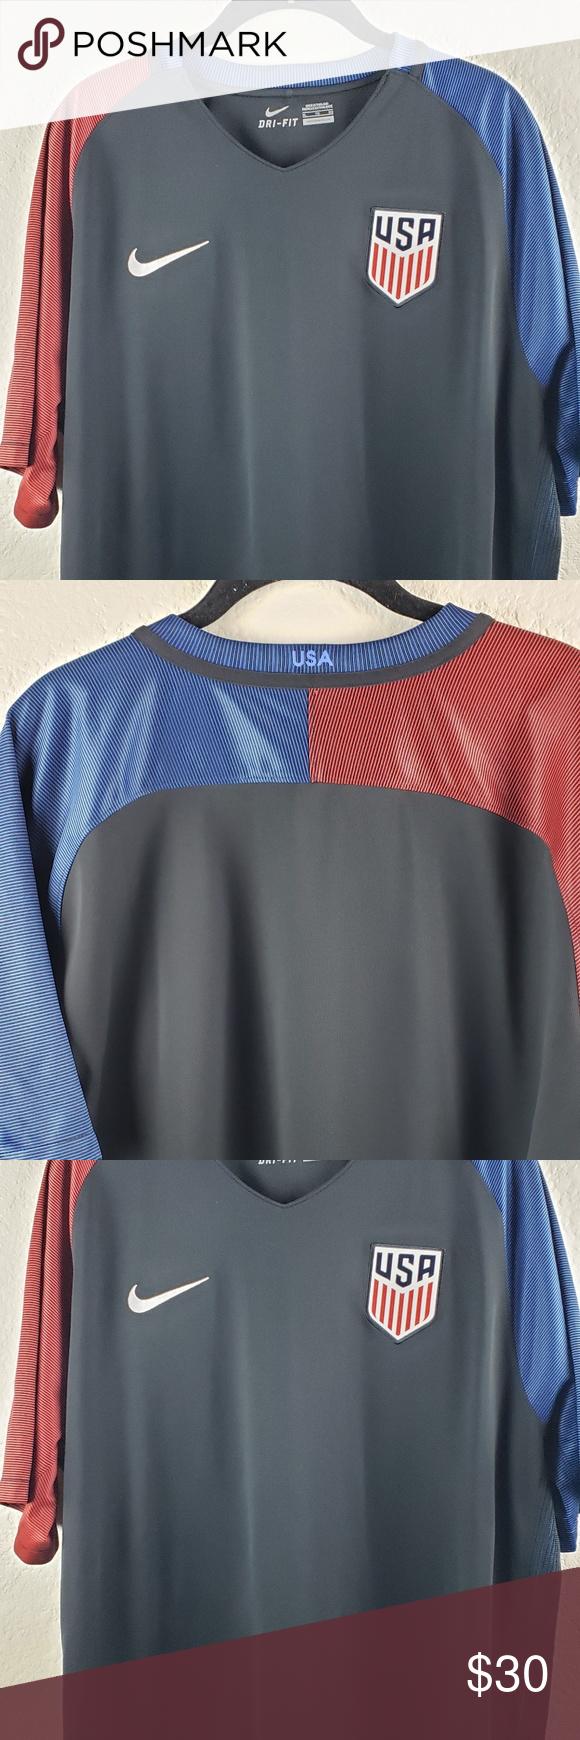 b62752a8 ... Shirt Good condition. Nike Shirts Tees - Short Sleeve · Nike Men's | DRI -FIT XL Nike DRI-FIT 2016 Team USA Authentic Soccer